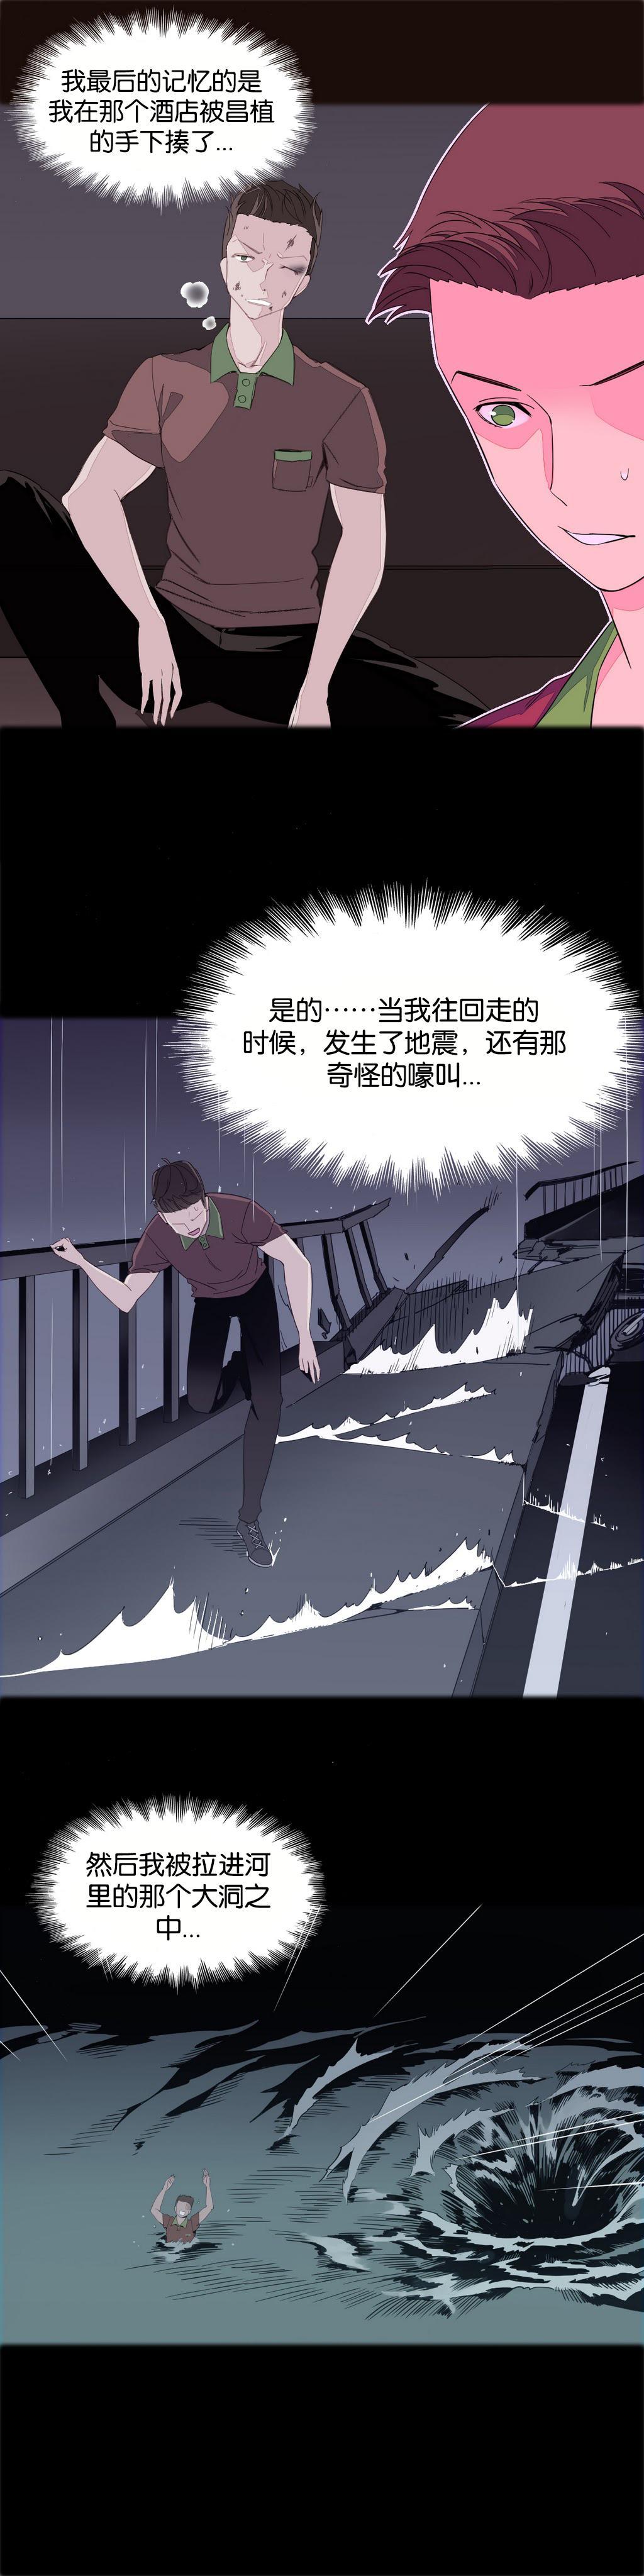 [Rozer] 一个由我统治的世界(A World that I Rule) Ch.1-3 [Chinese] 51